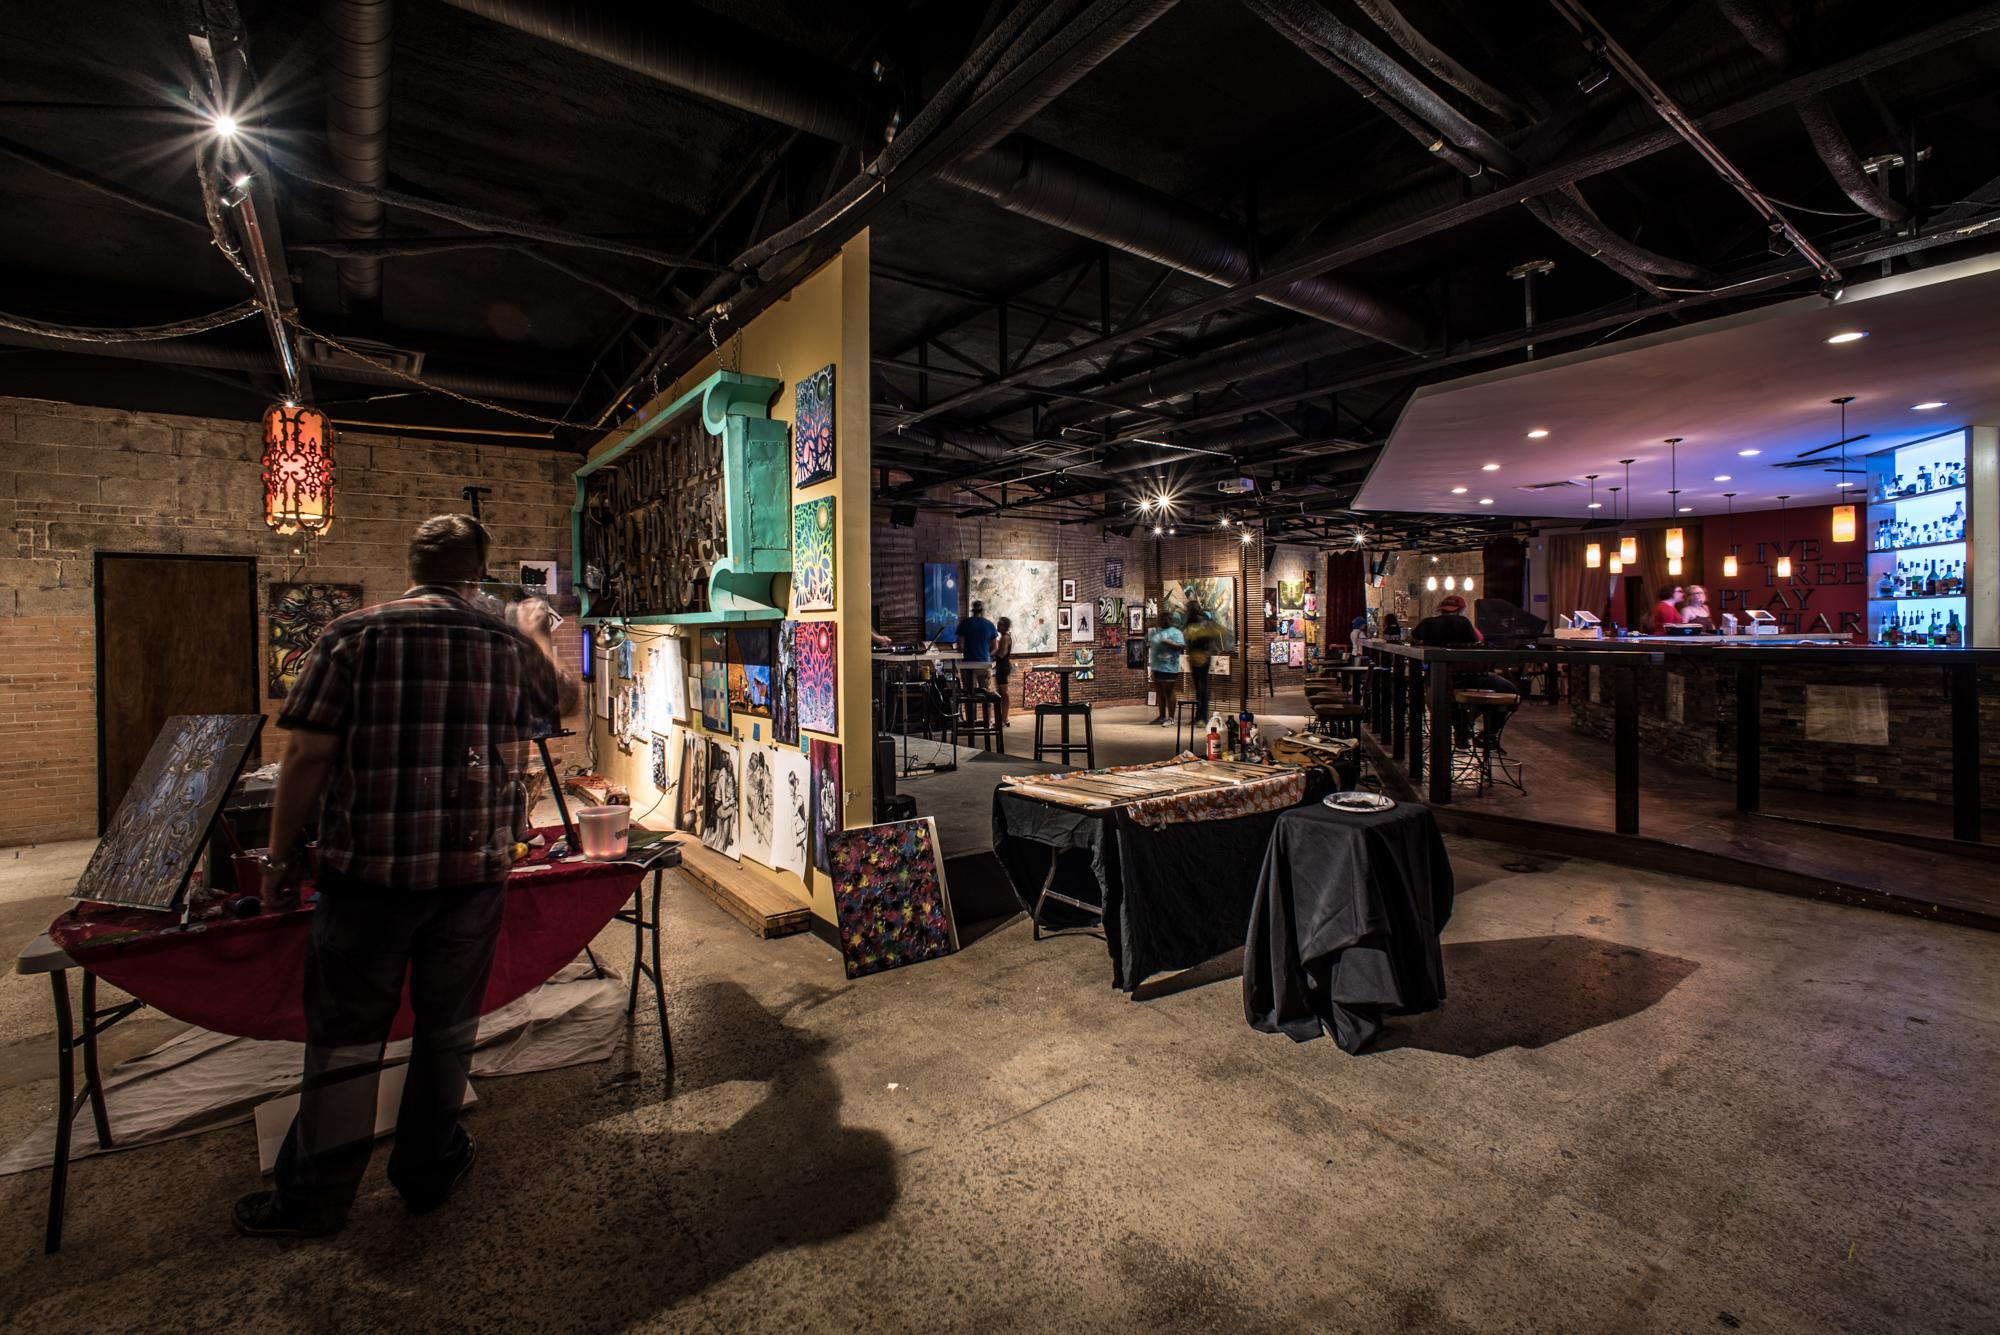 D Magazine Nightlife - Taboo Lounge Interior & Exterior - 090316 - Bret Redman-010